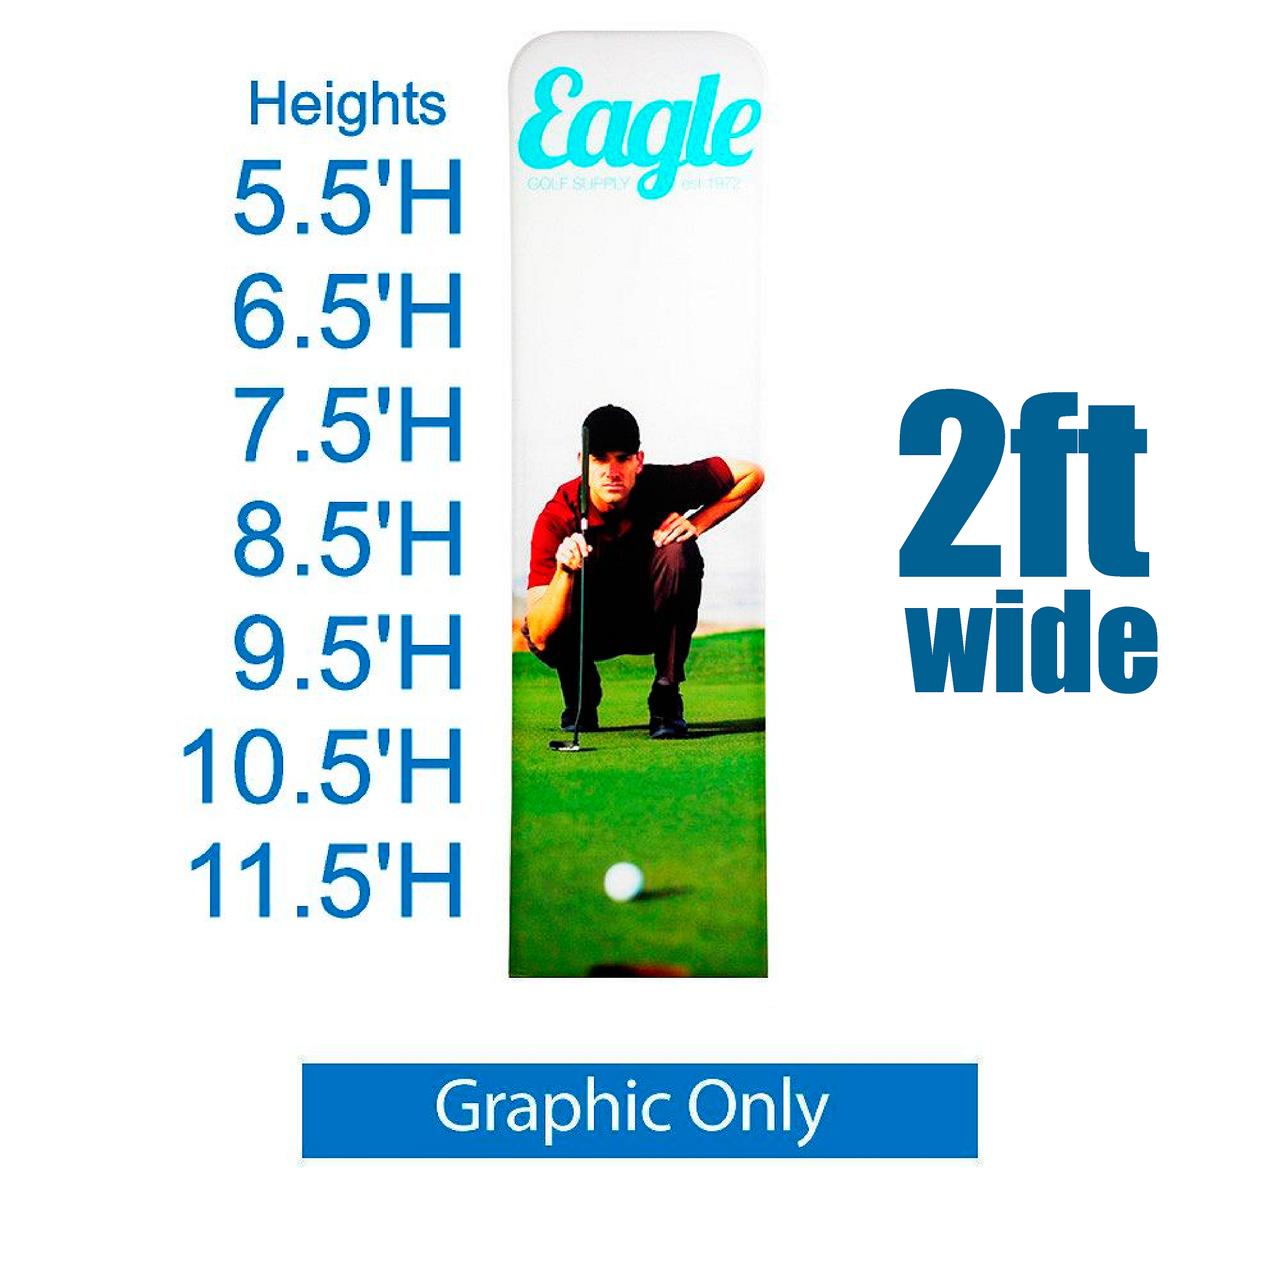 REPLACEMENT PRINT EZ Extend 2 ft width Tension Fabric - Premium 5.5 ft - 11.5 ft